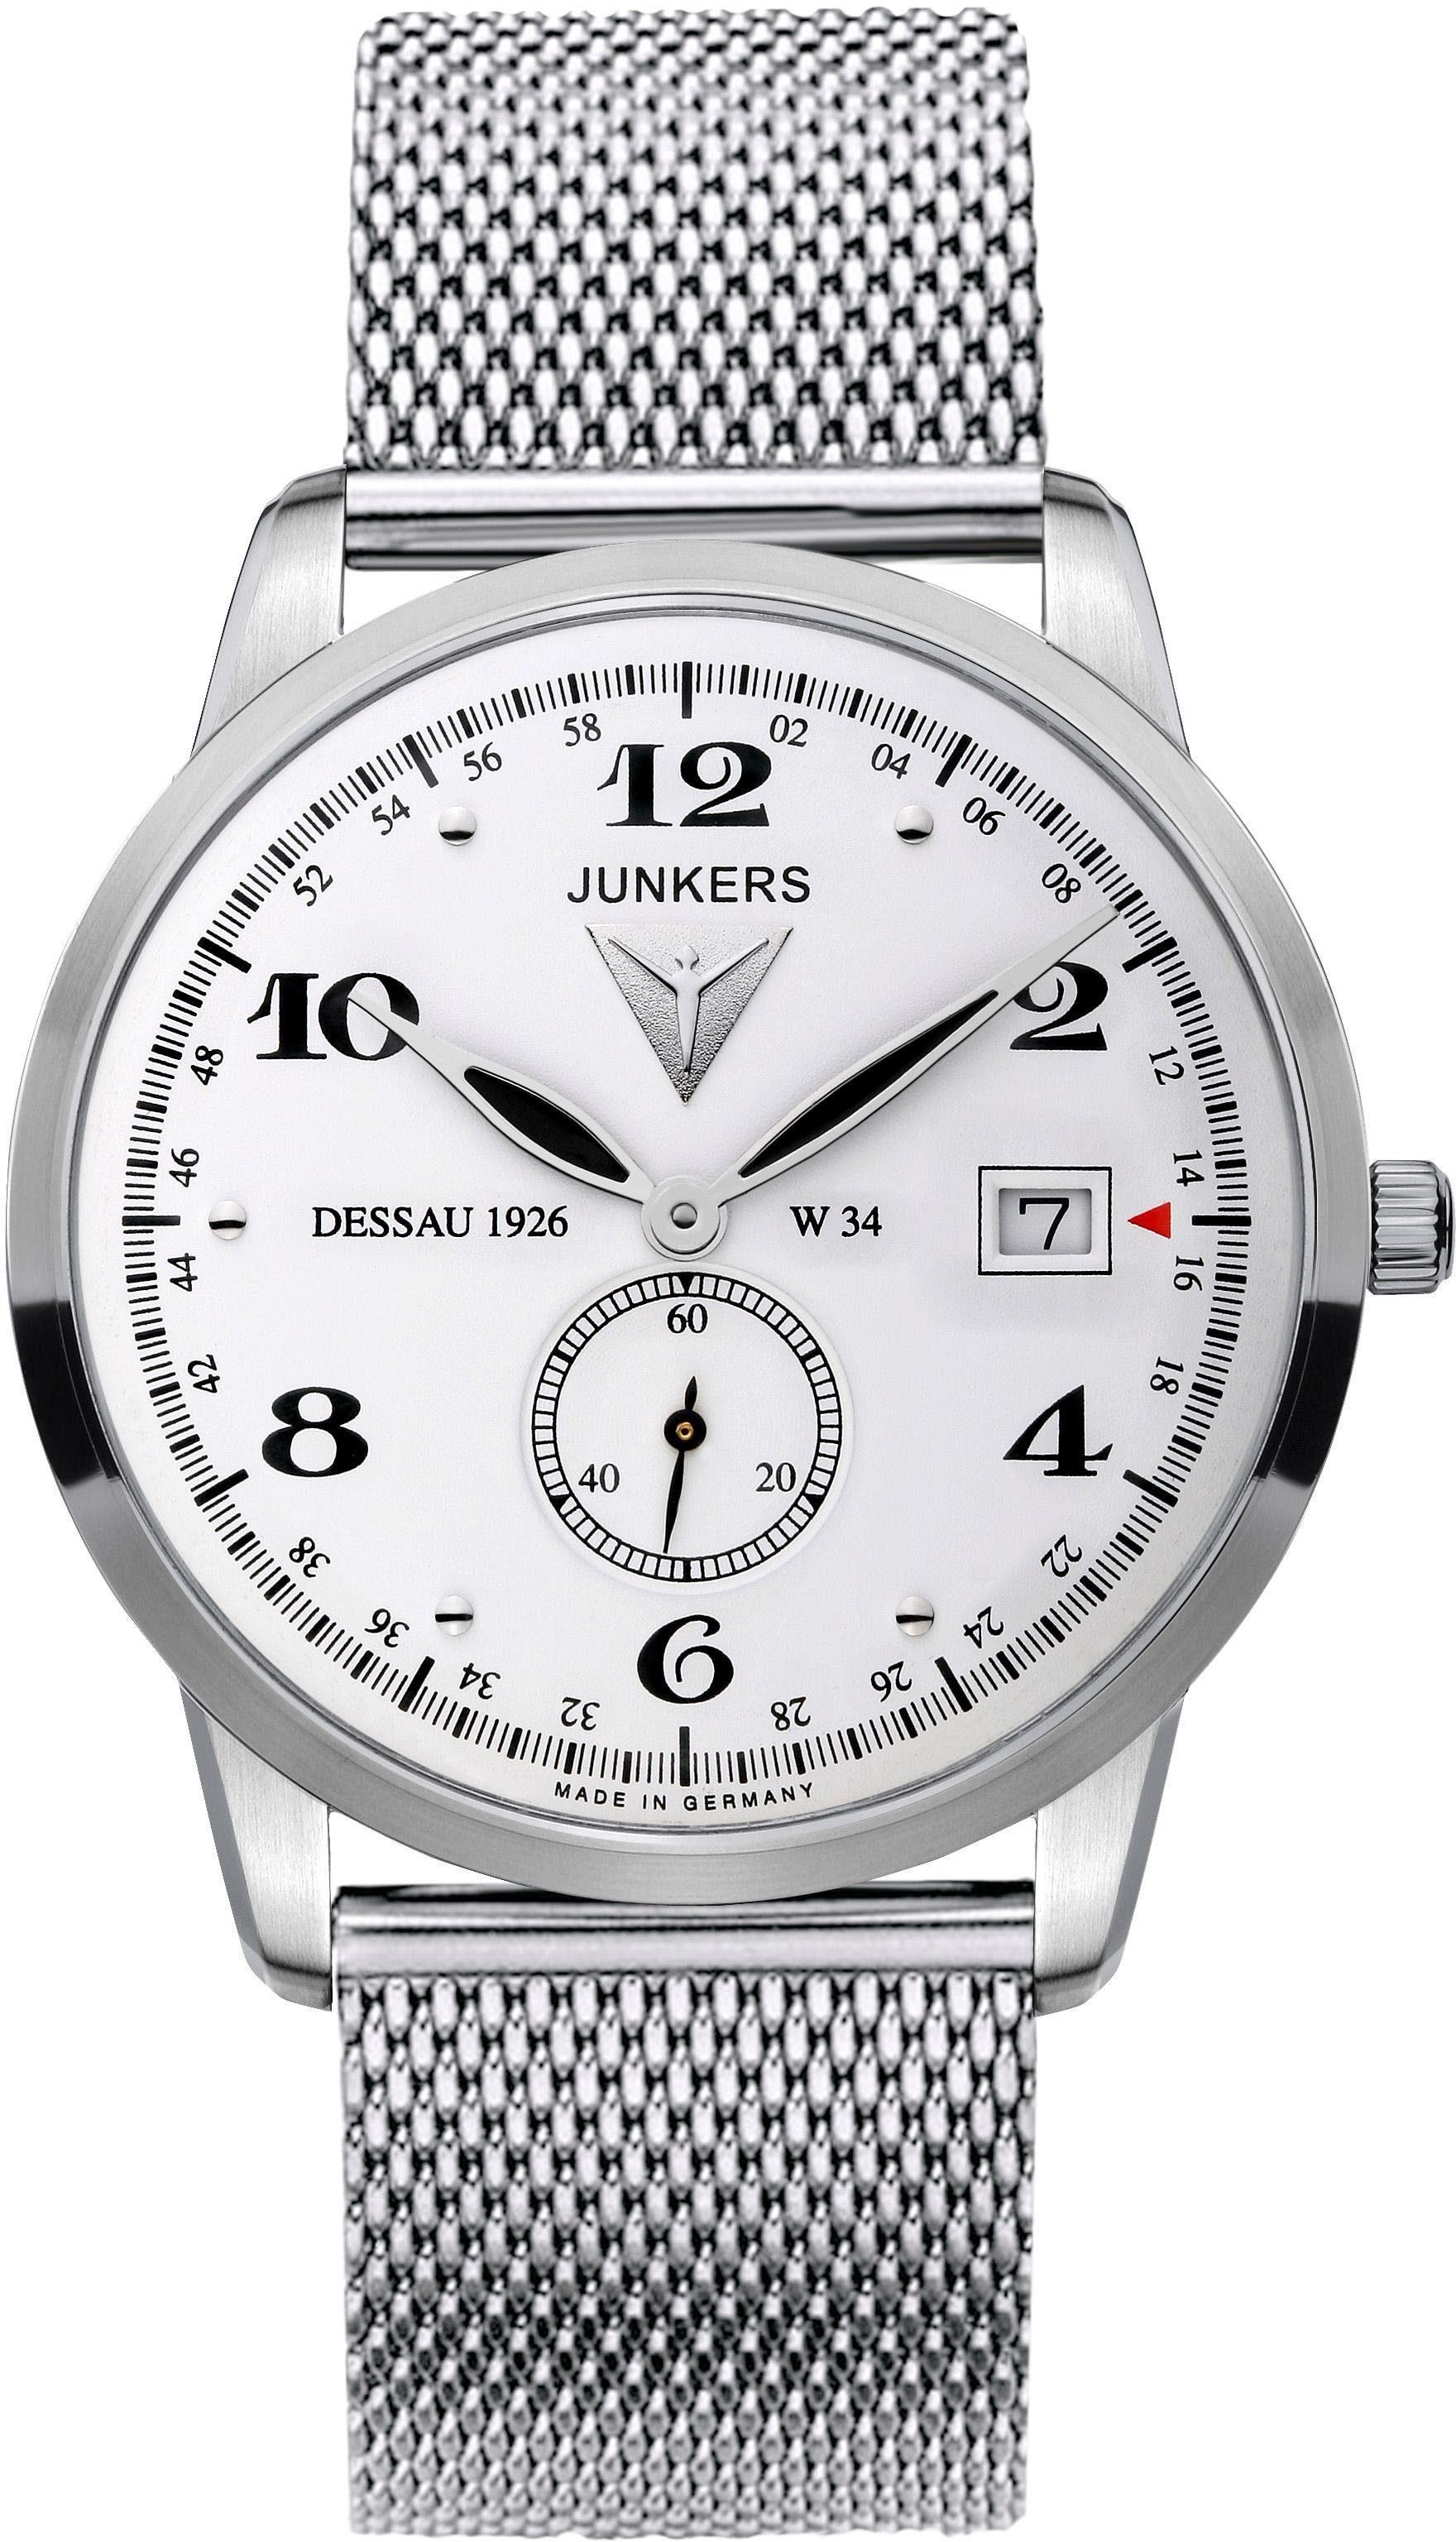 Junkers-Uhren Quarzuhr »Junkers Dessau 1926 Flatline, 6334M-1« made in Germany